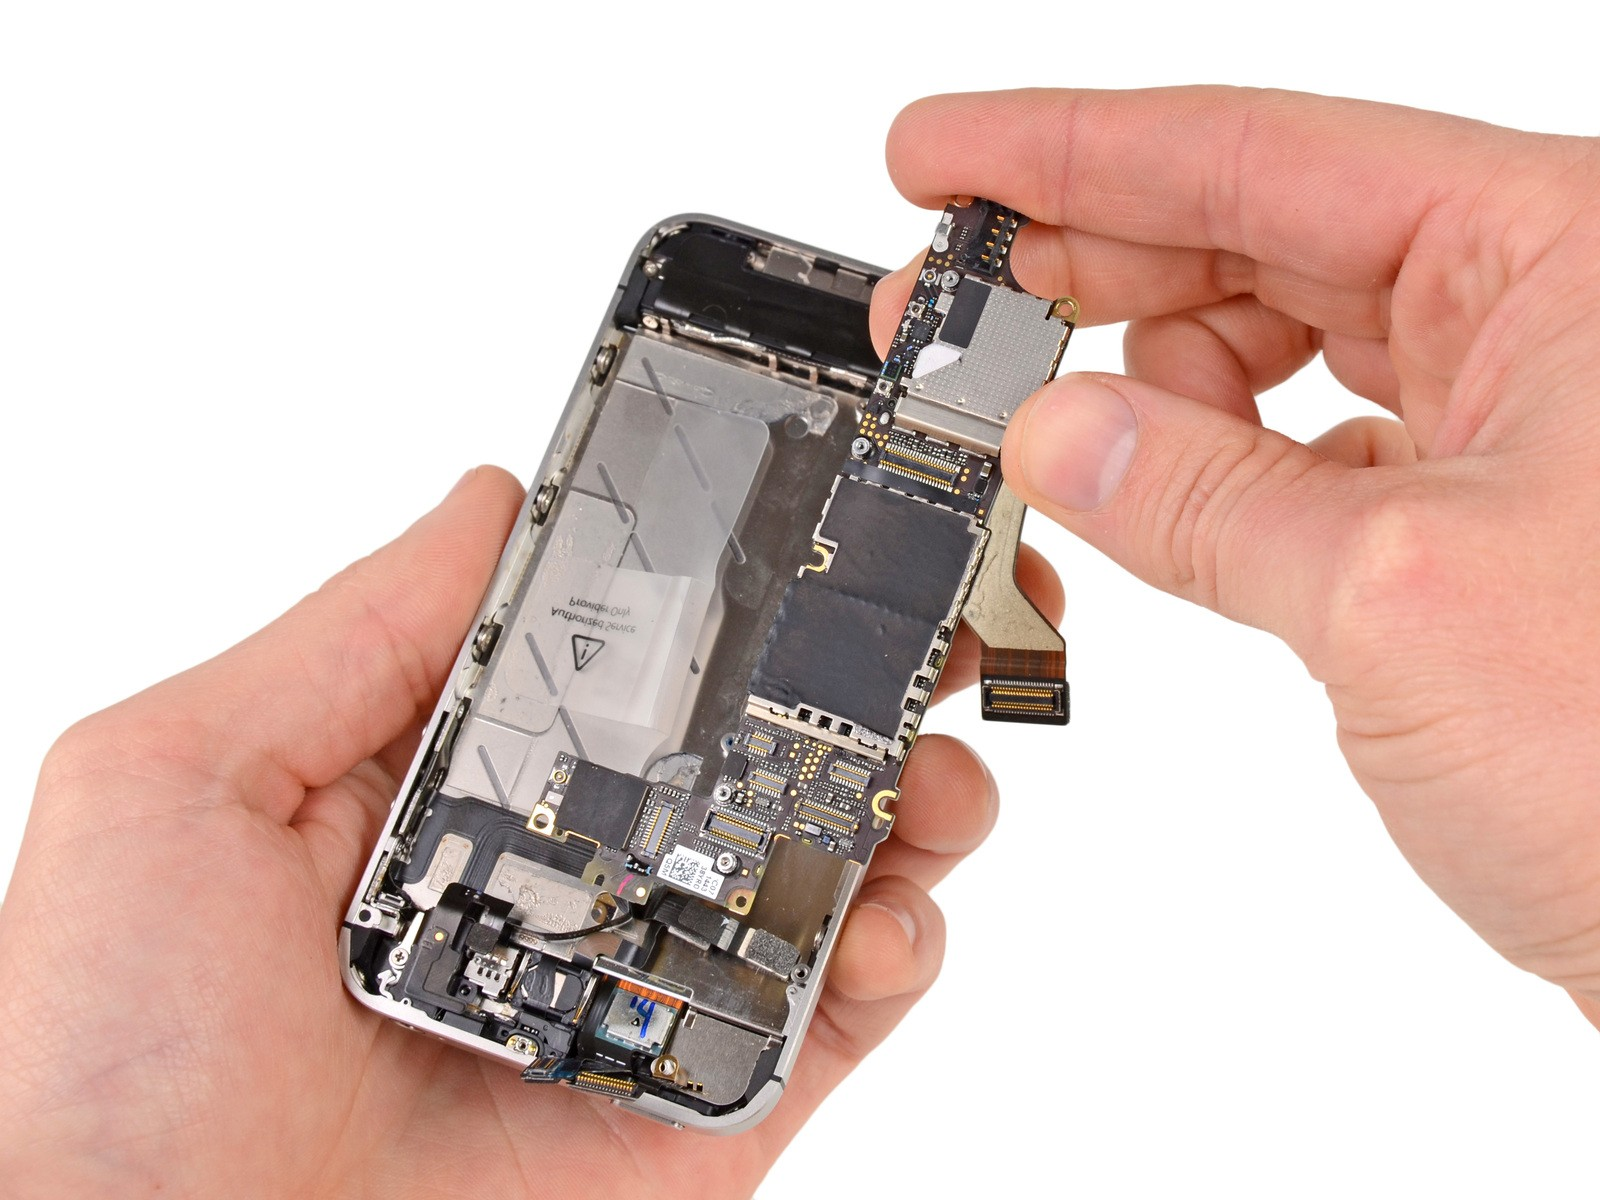 Sửa lỗi nút home bị liệt - sửa main iPhone 4